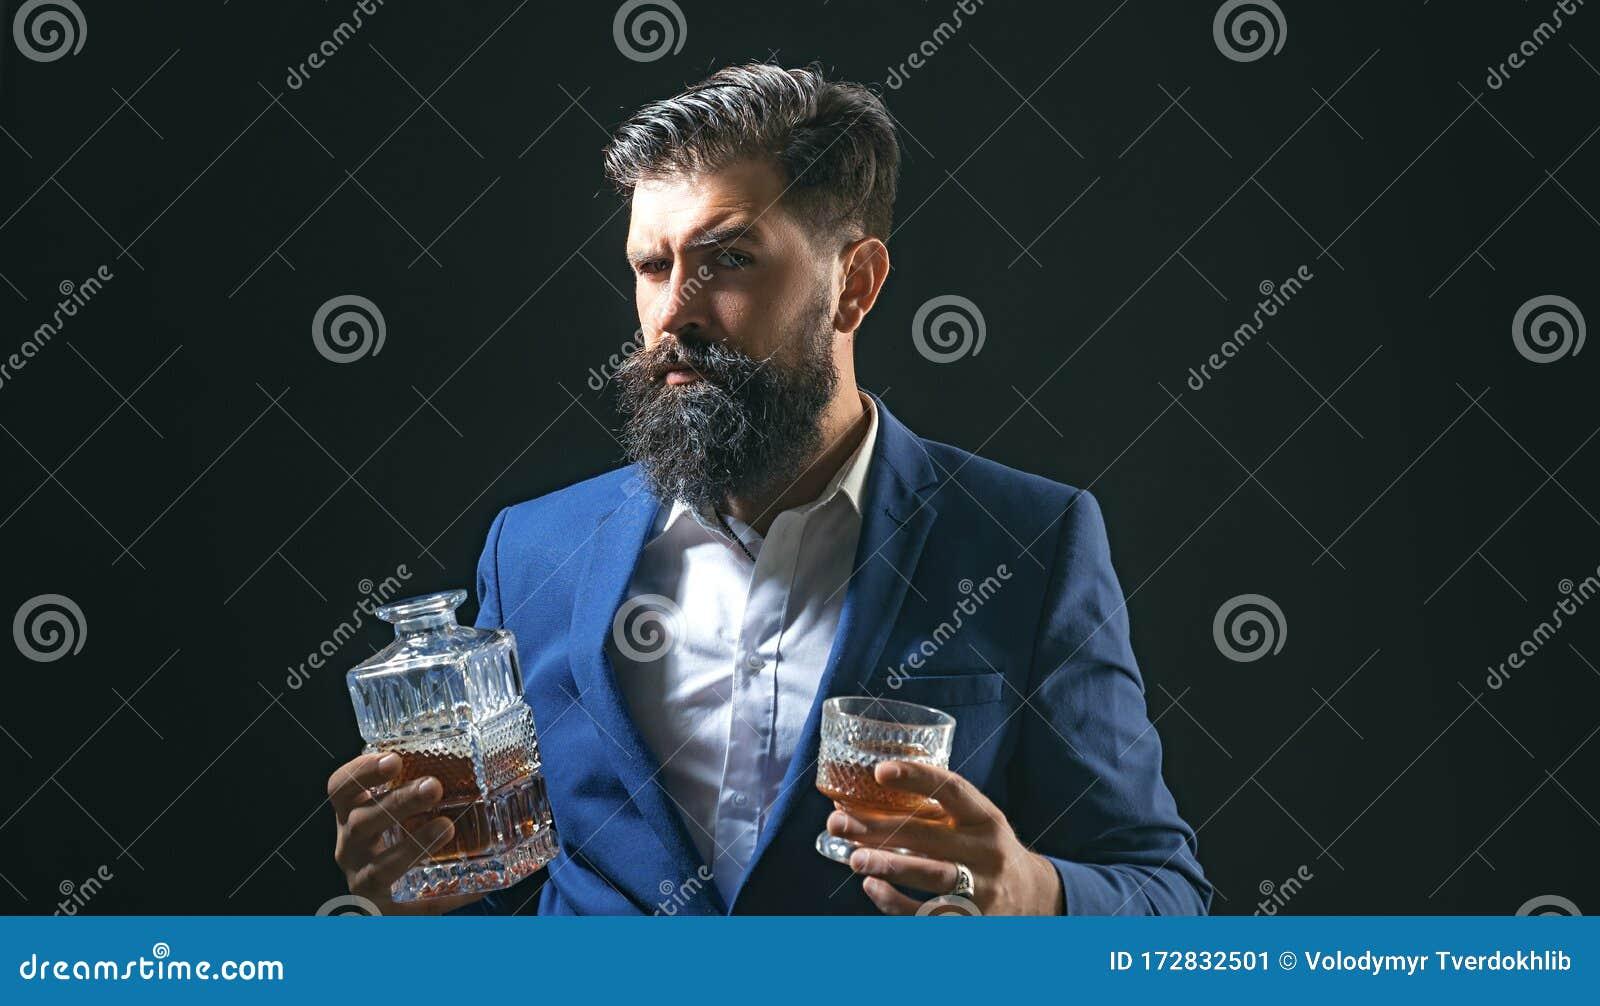 dating bartender masculin